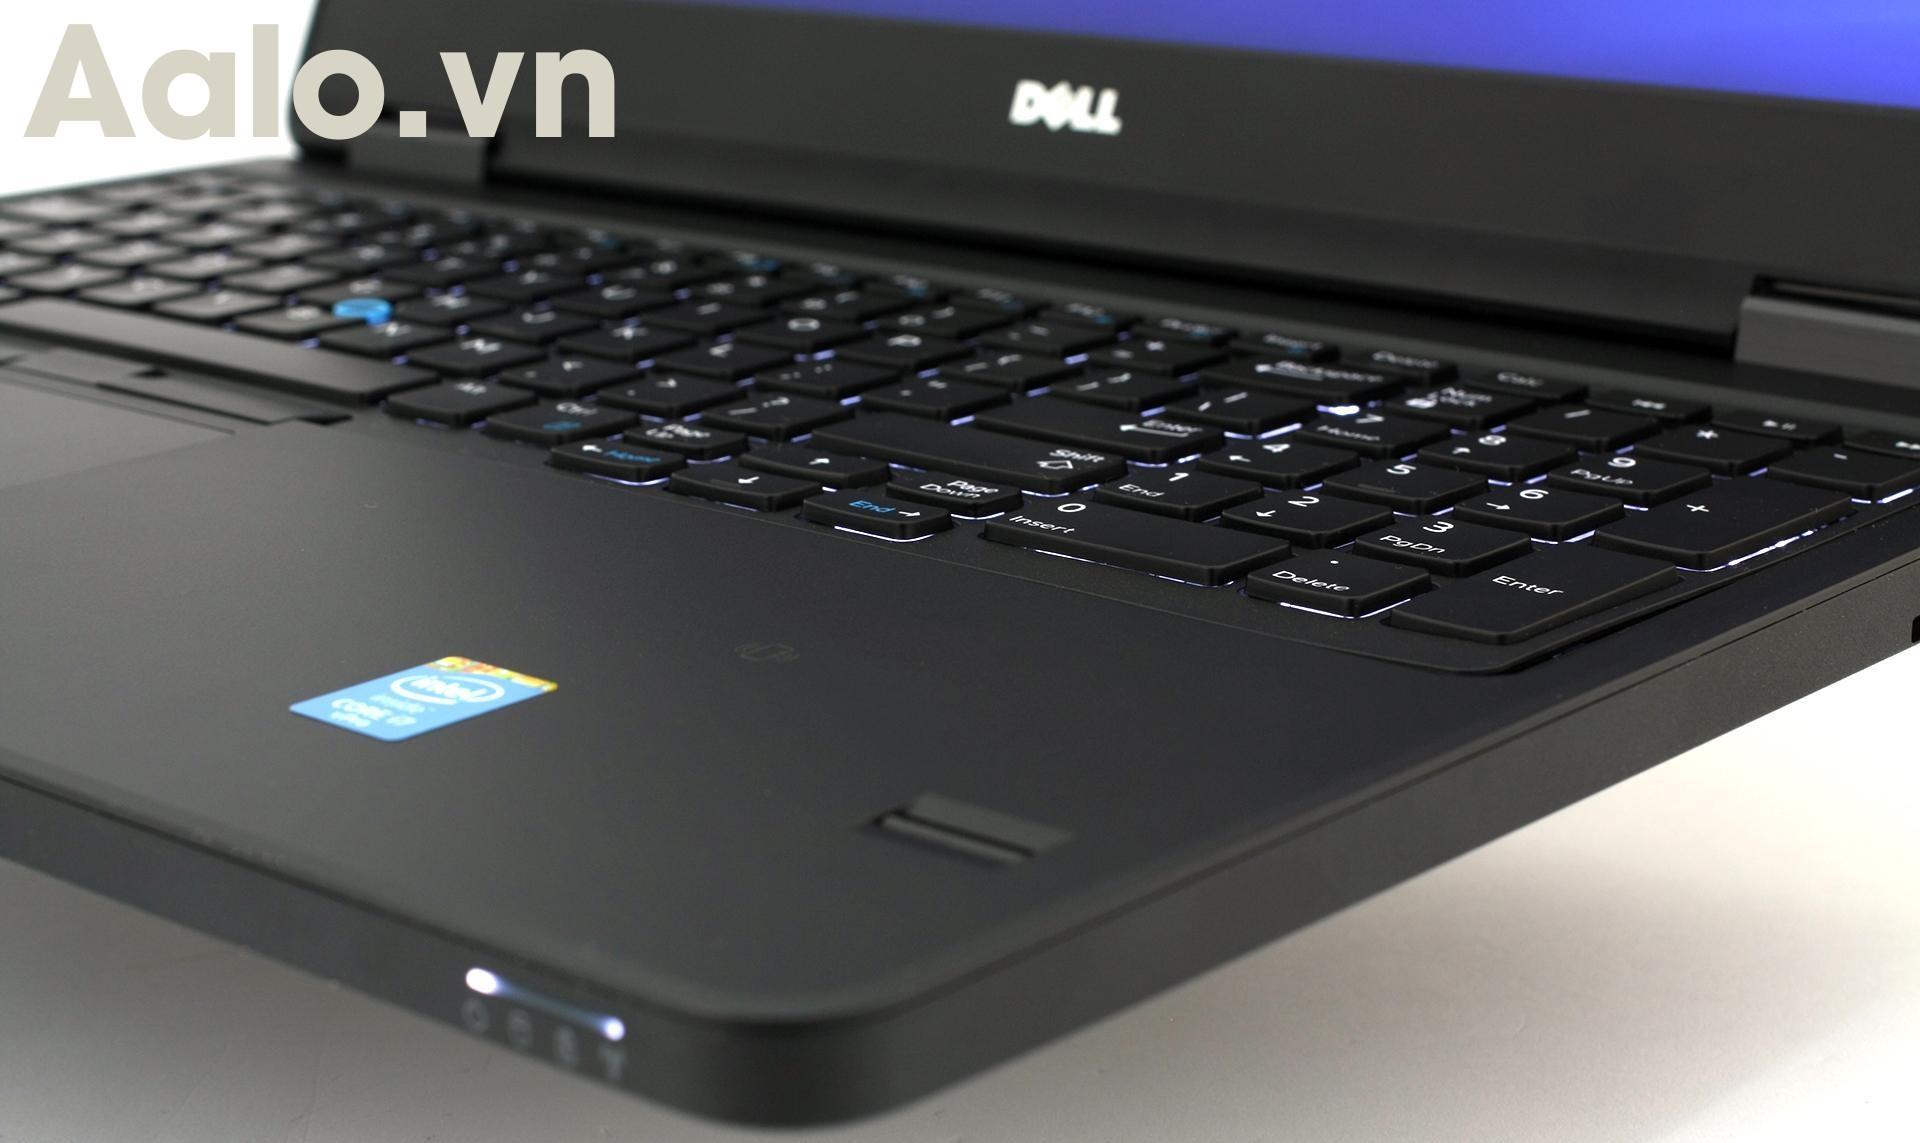 Laptop cũ Dell Latitude E5550 (I7 5600U/ 4GB/ HDD 320GB/ 15.6 inch HD)